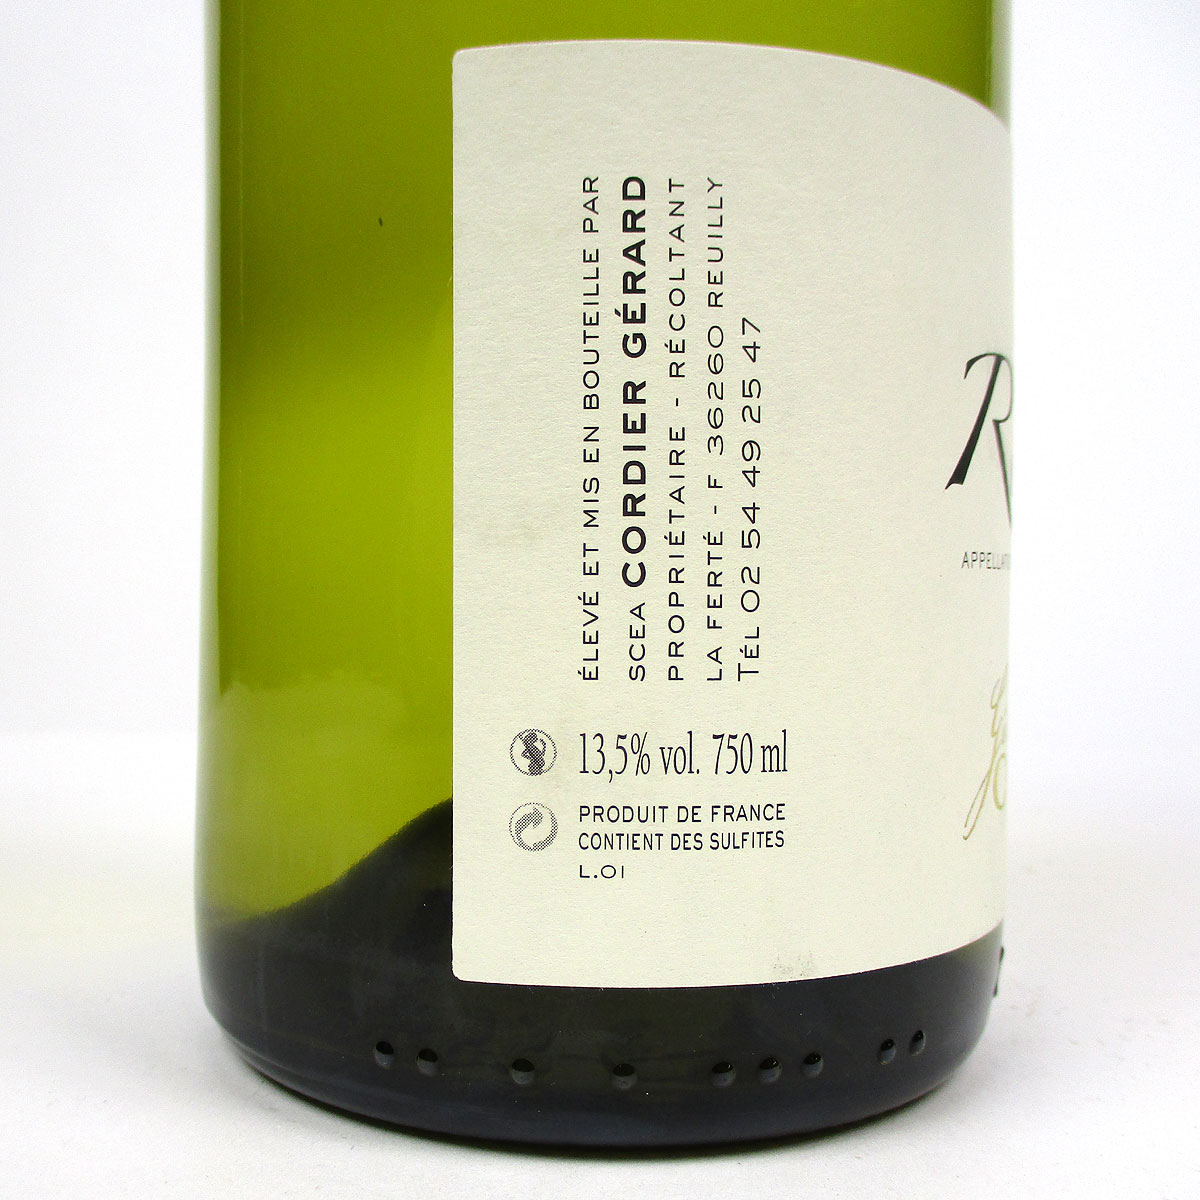 Reuilly: Gerard Cordier Blanc 2020 - Bottle Side Label